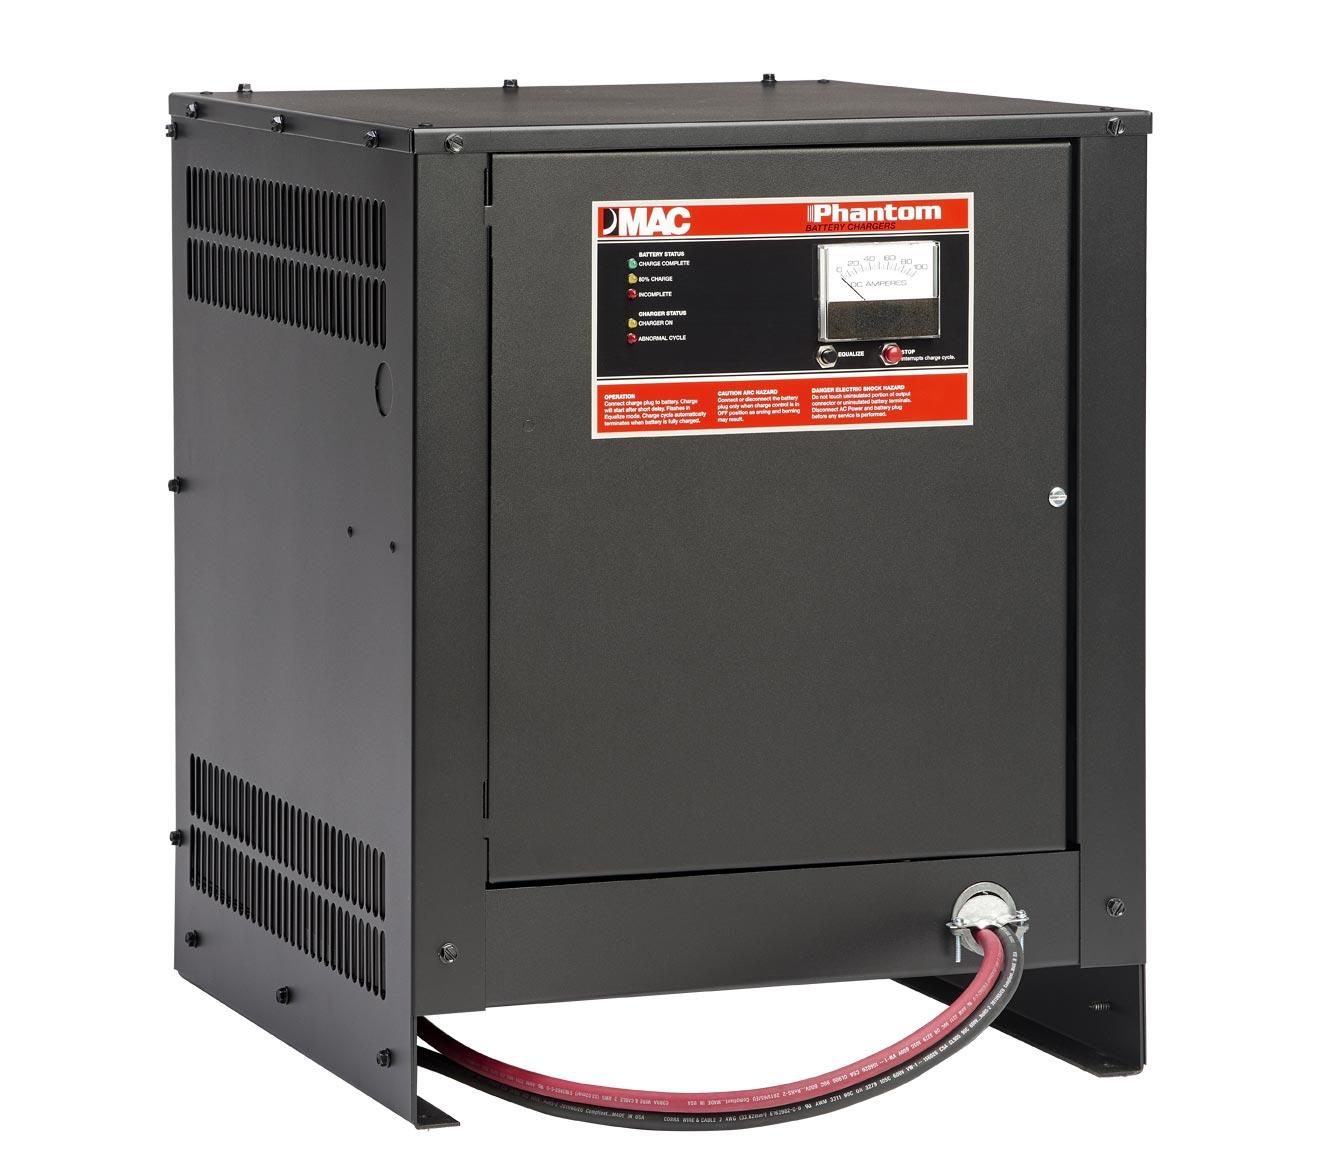 PHANTOM industrial-battery-charger-phantom